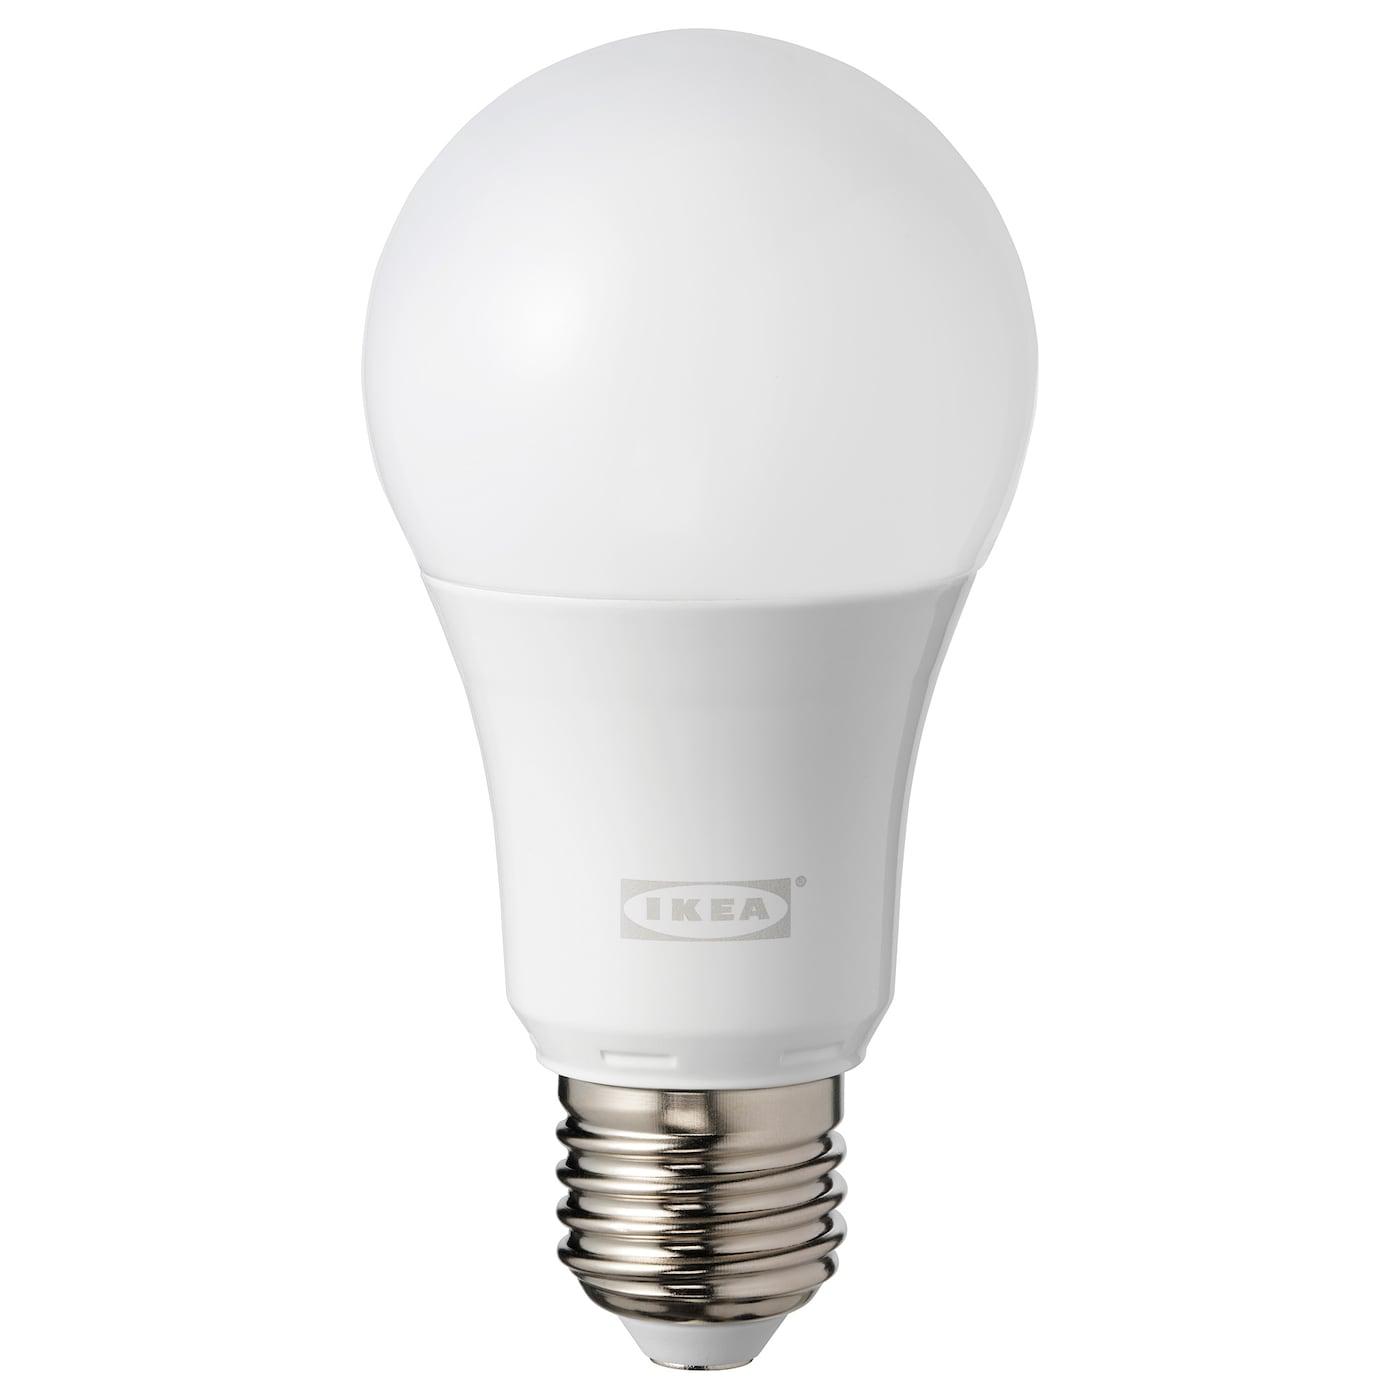 Smart verlichting - Draadloze led-lichtbron - IKEA